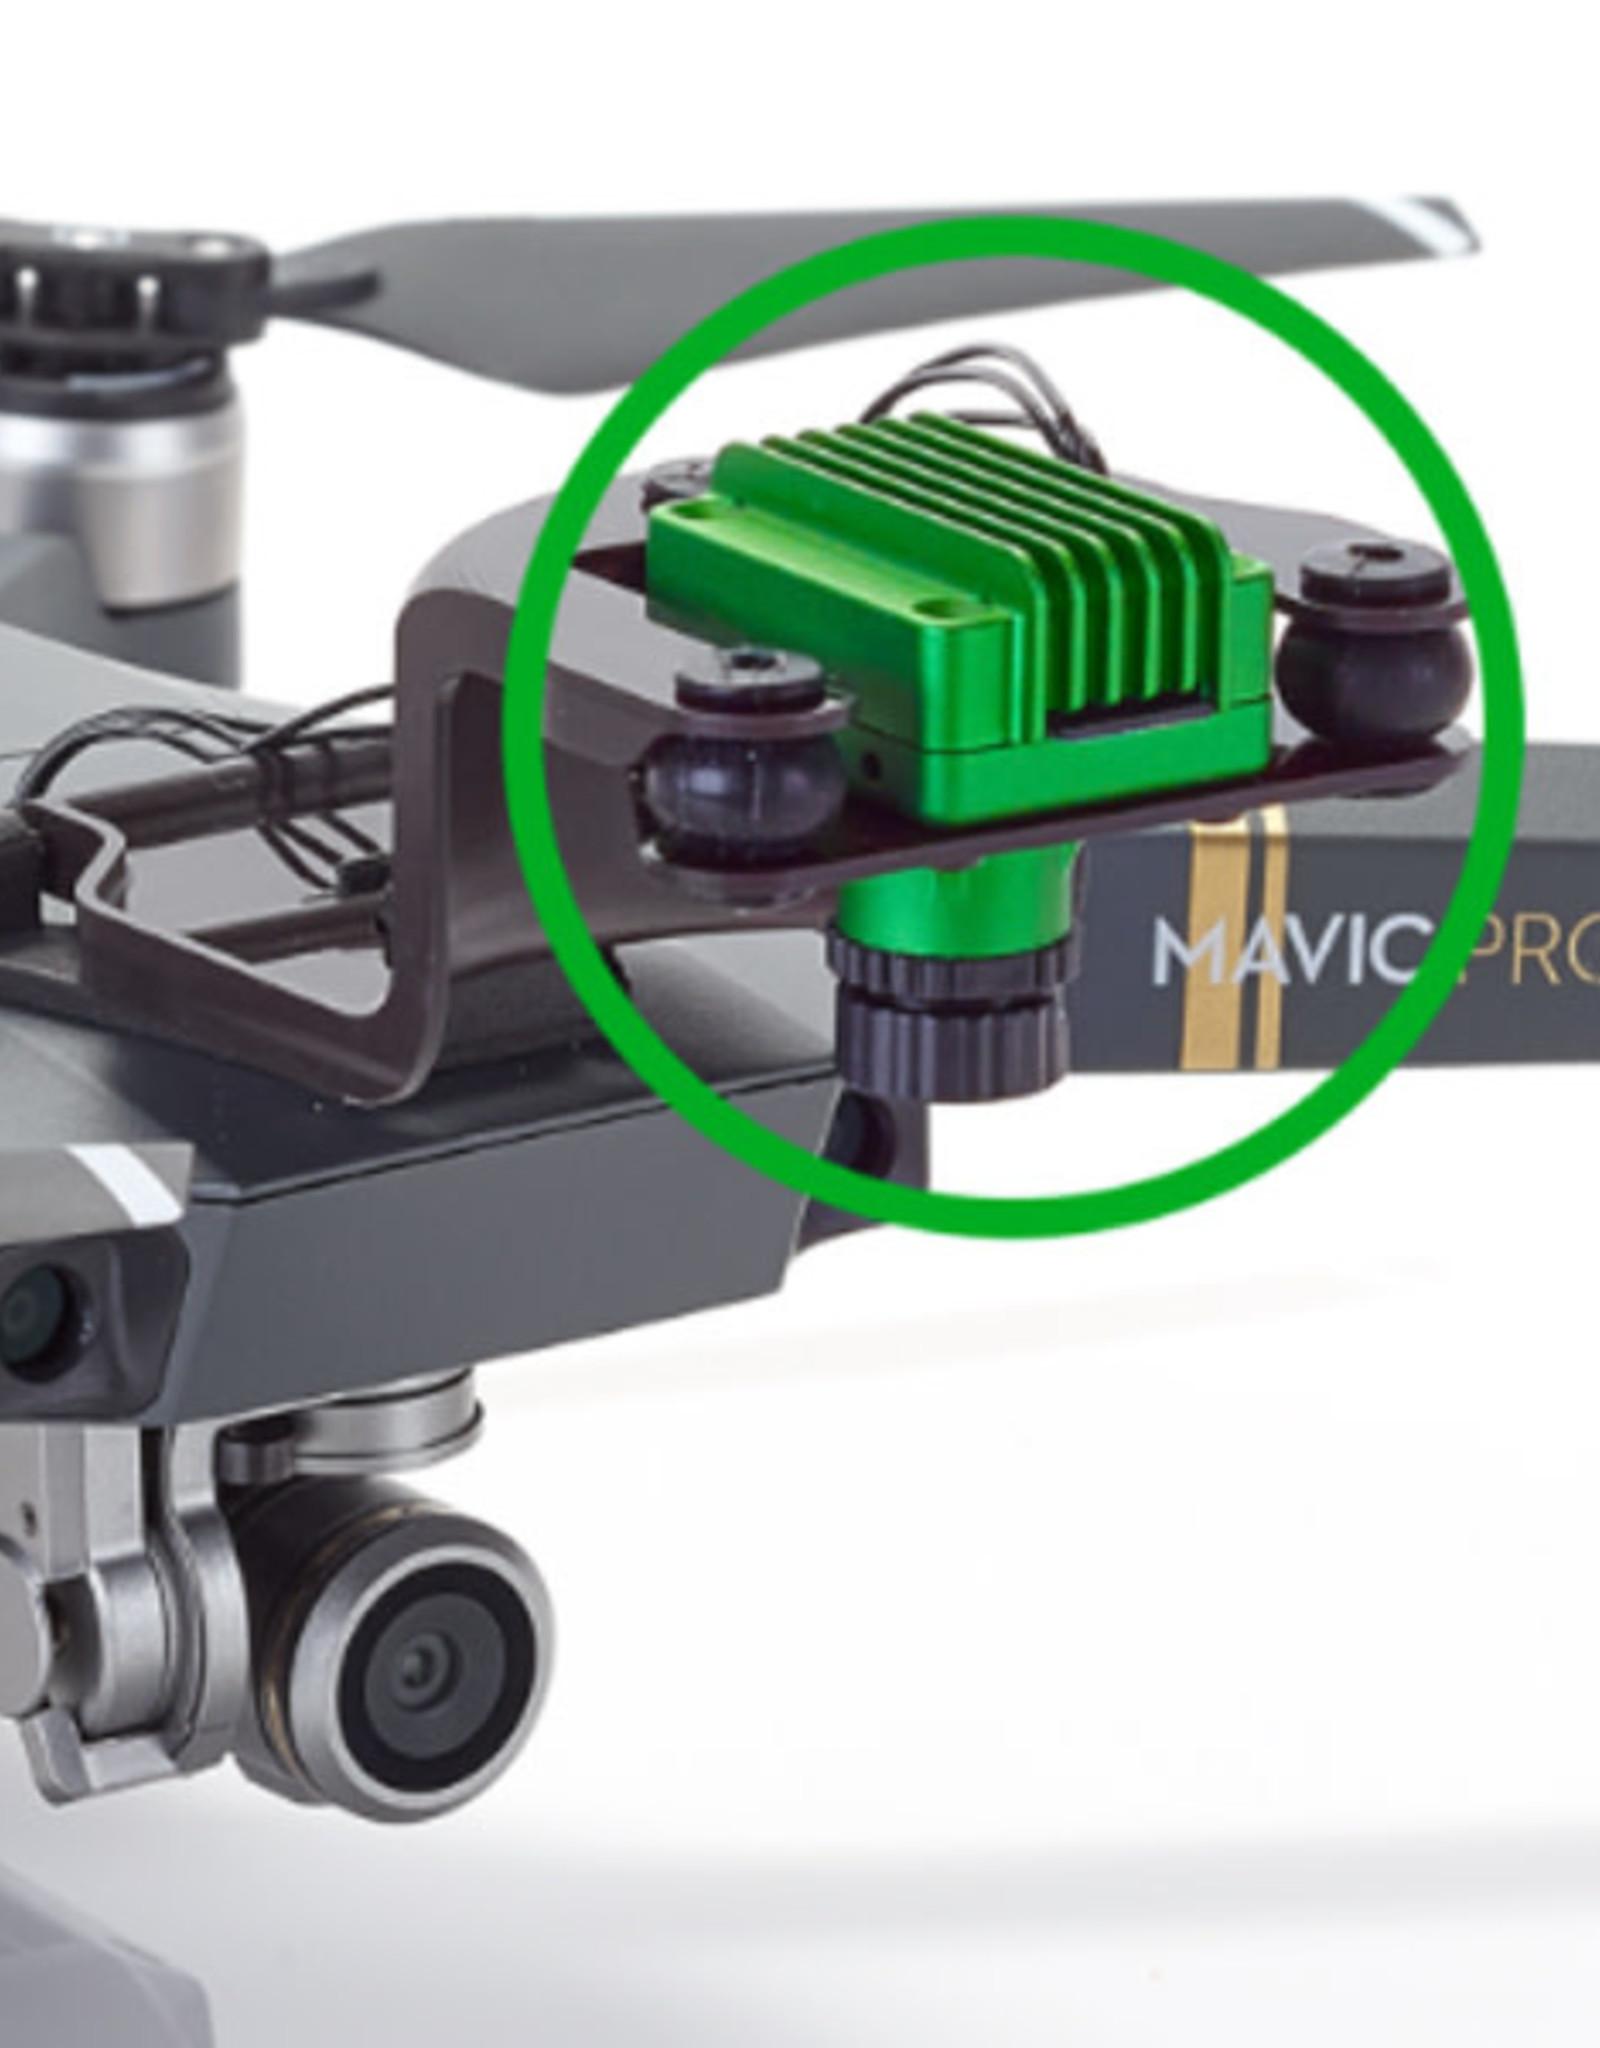 Sentera DJI Mavic 2 NDVI Upgrade